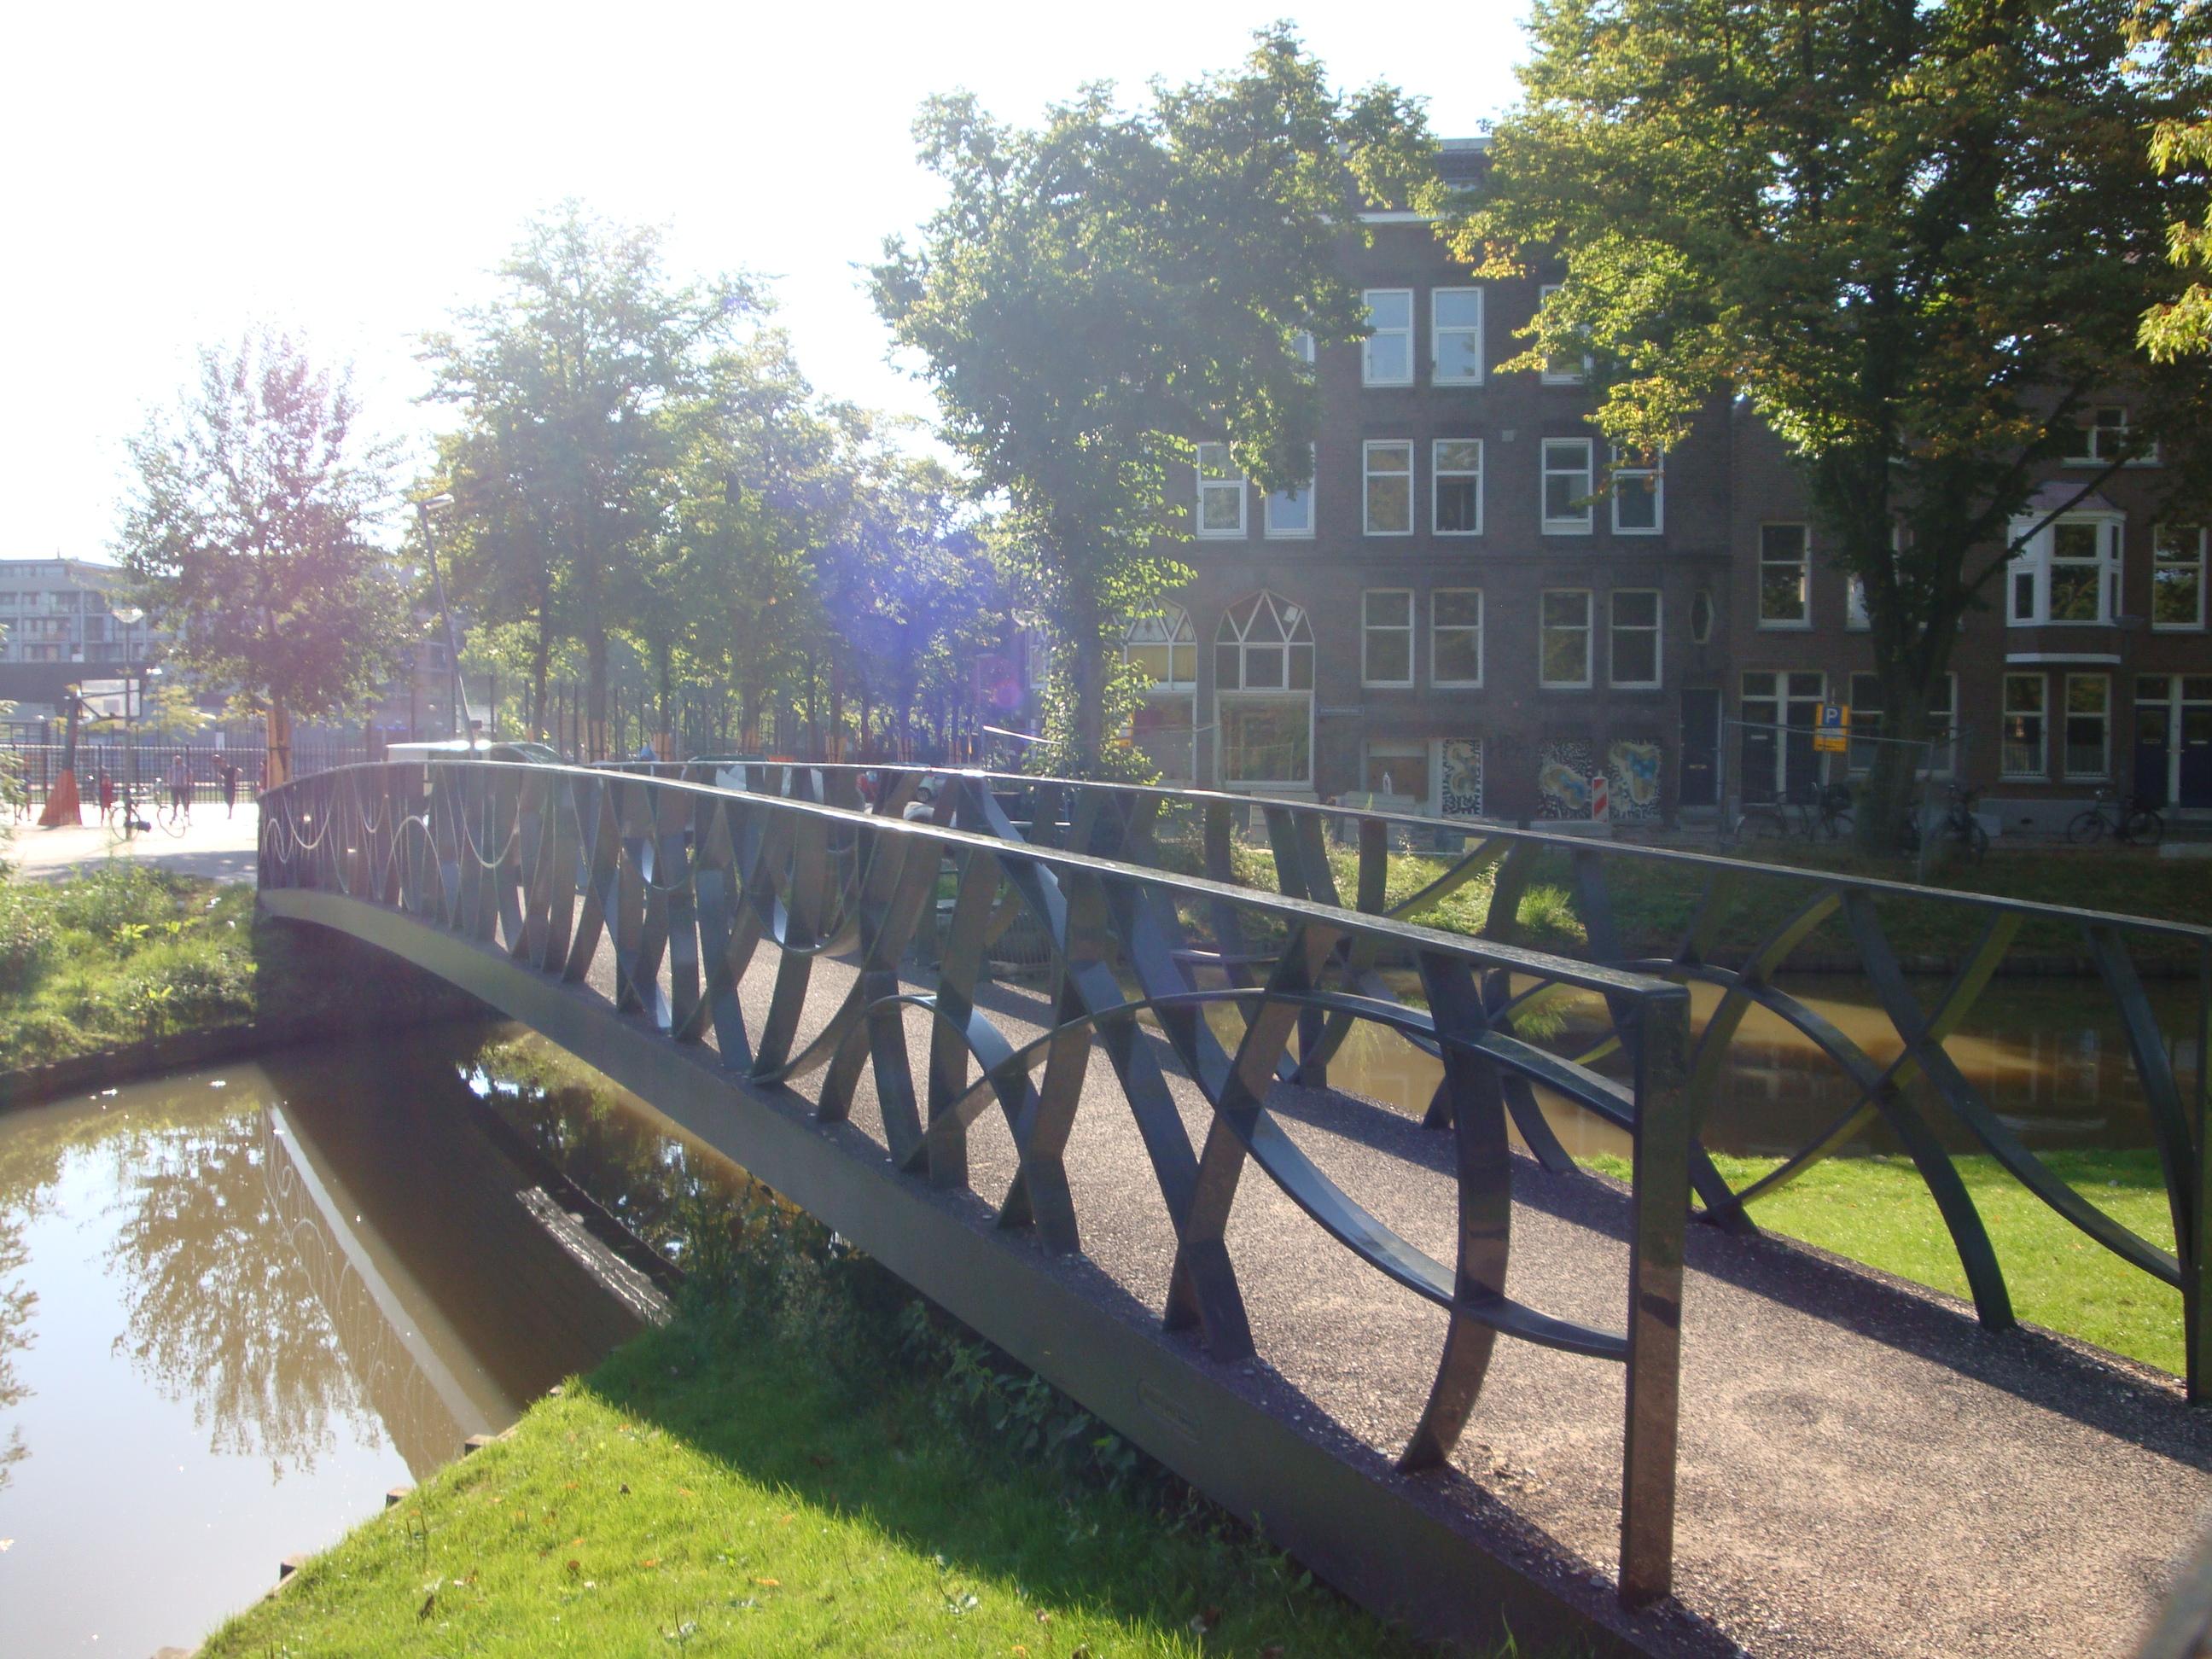 InfraCore pedestrian bridge Excersitiesingel Rotterdam NL